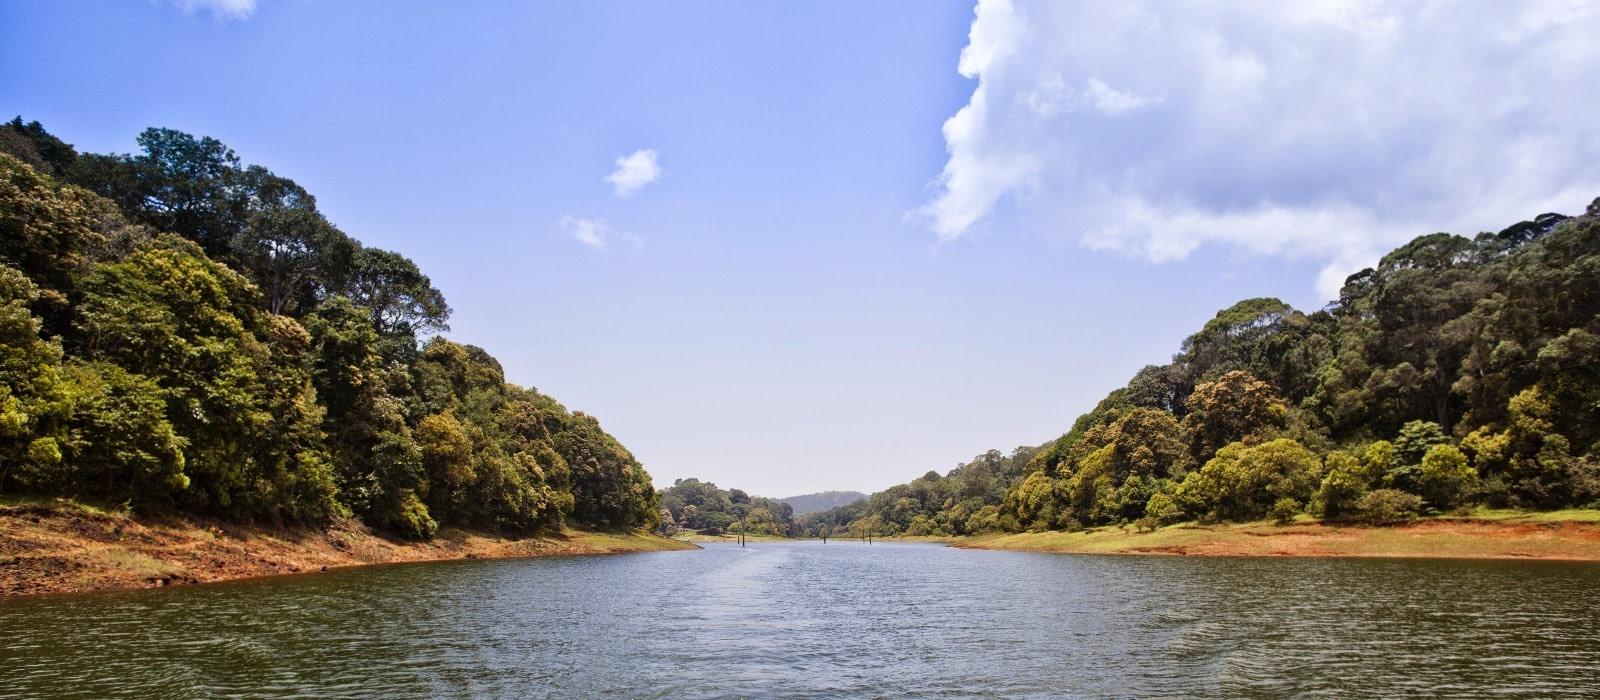 Reiseziel Thekkady Südindien